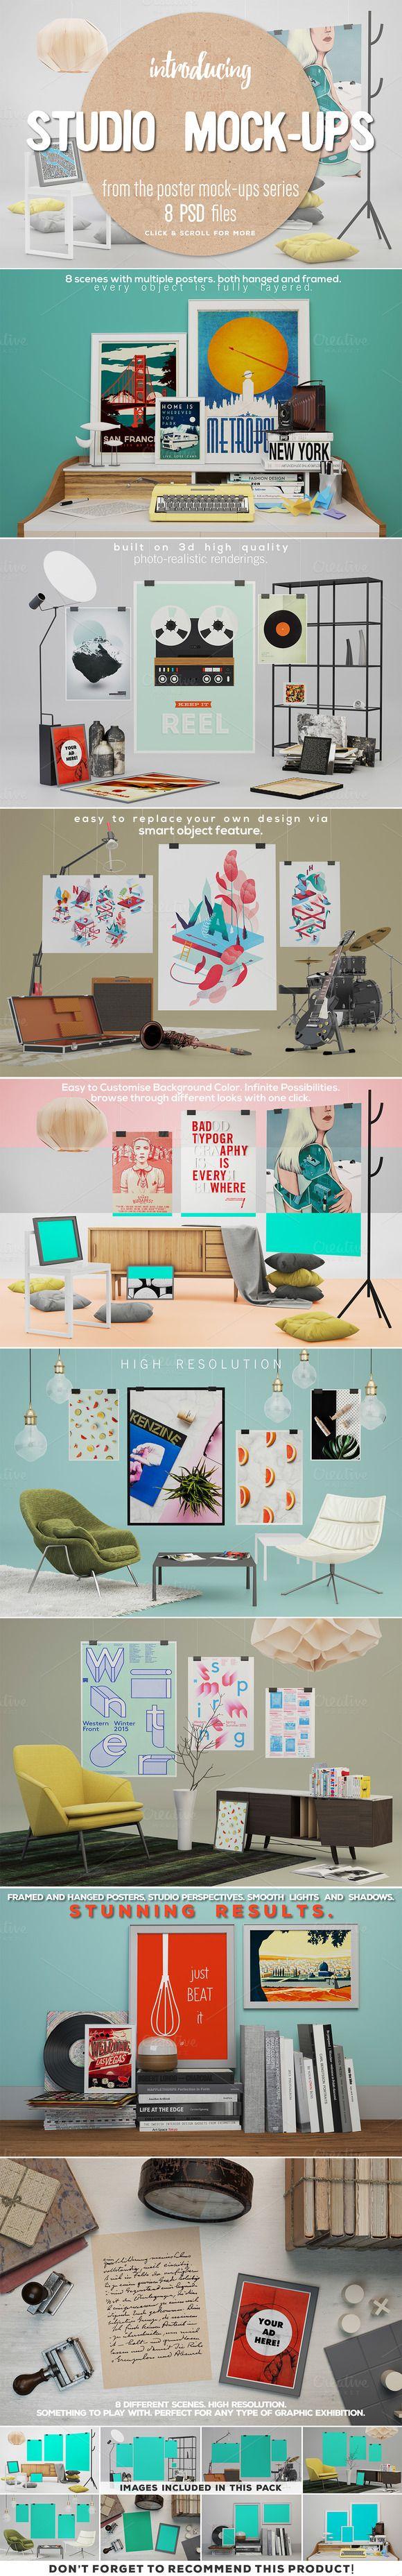 8 Studio Poster Mock-ups by Northern Kraft on Creative Market